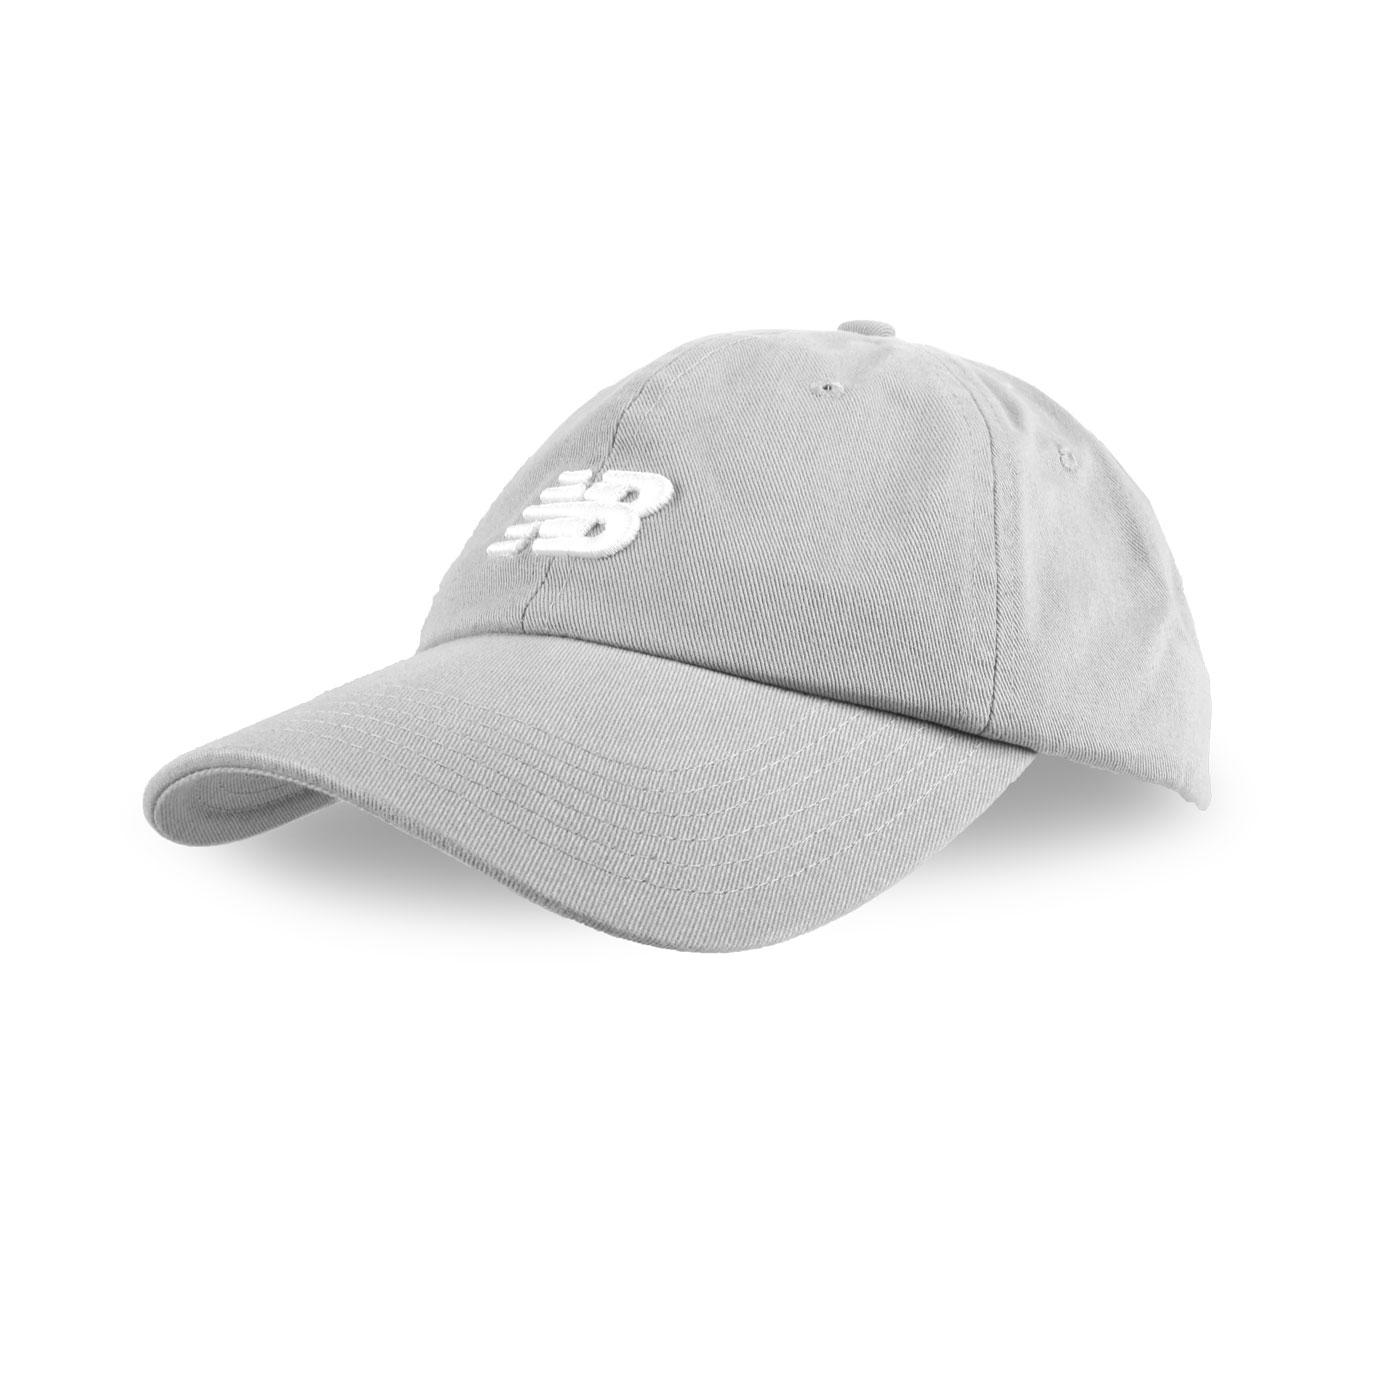 NEW BALANCE 棒球帽 LAH91014BK - 灰白